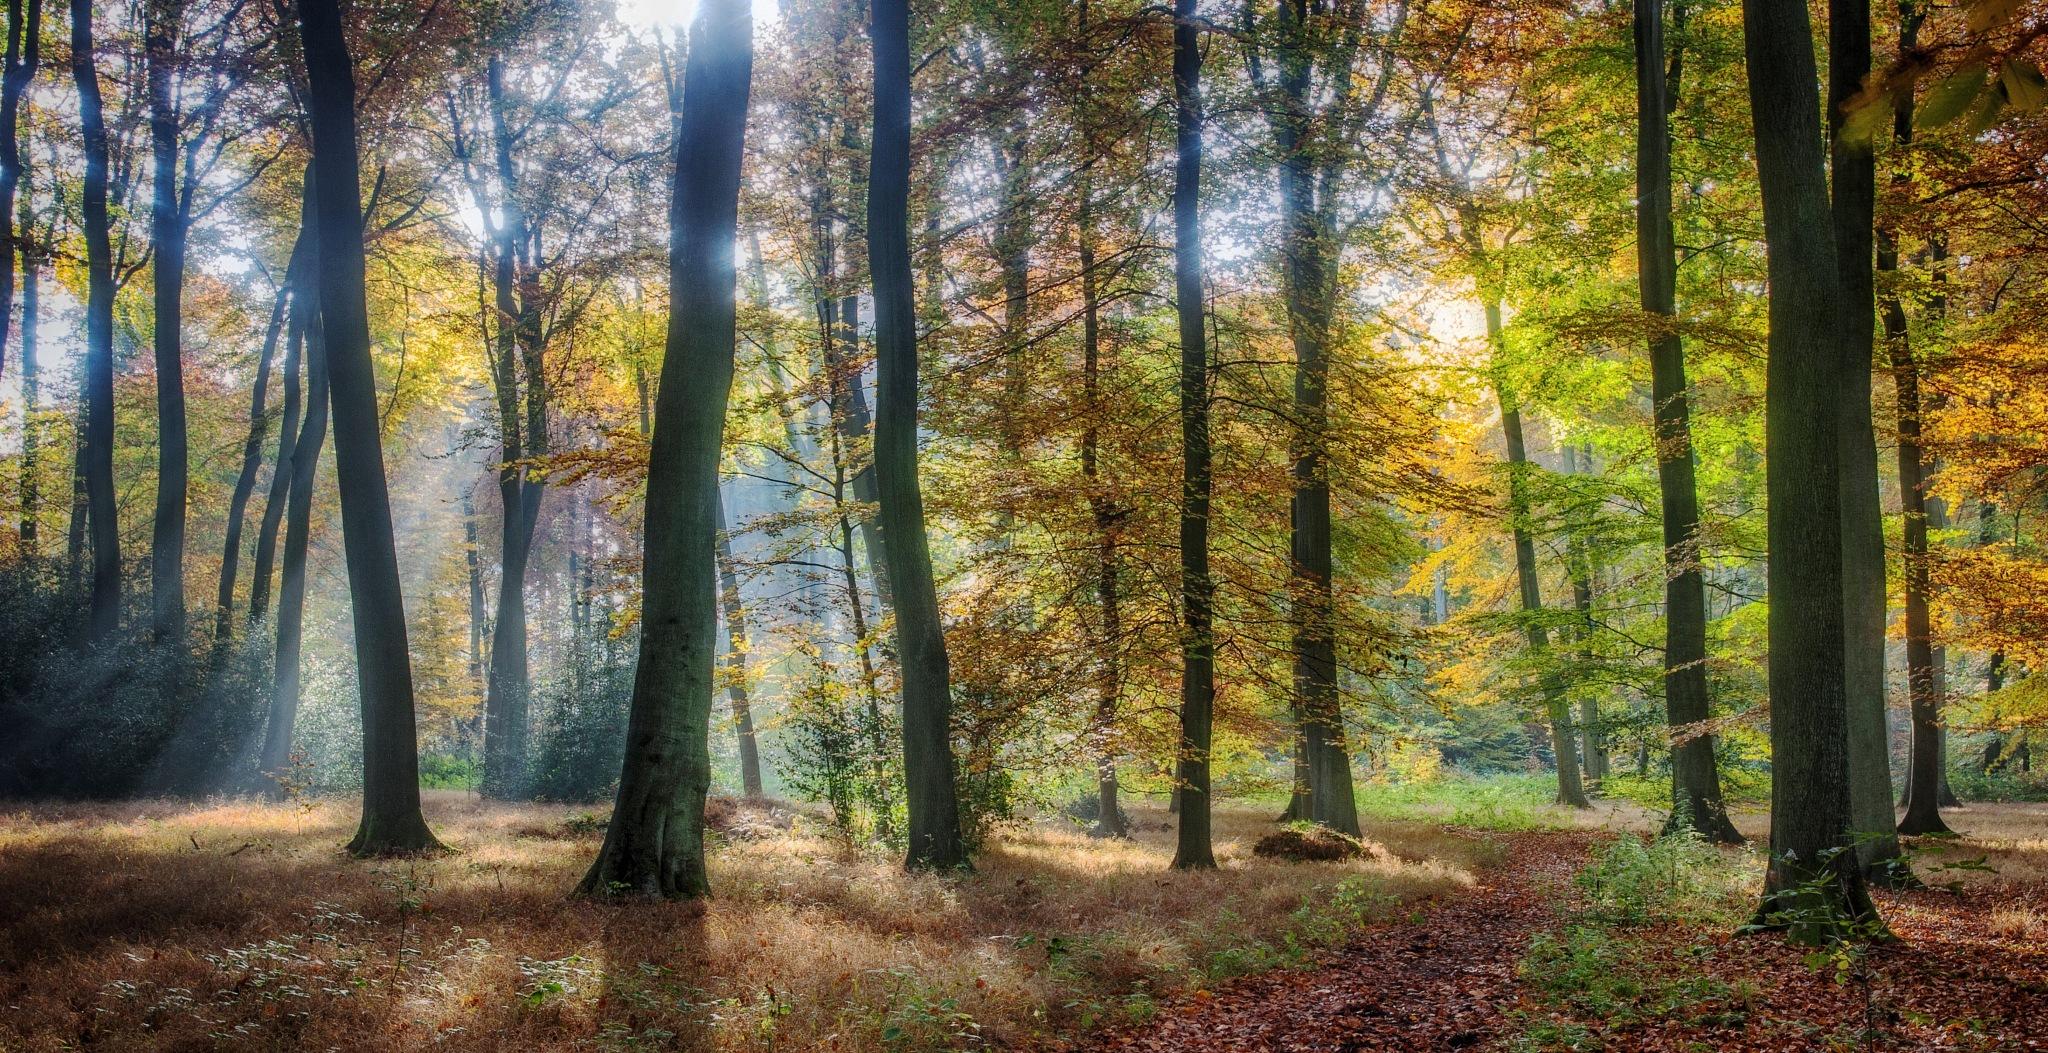 Bright Autumn Woods by cerijones14019